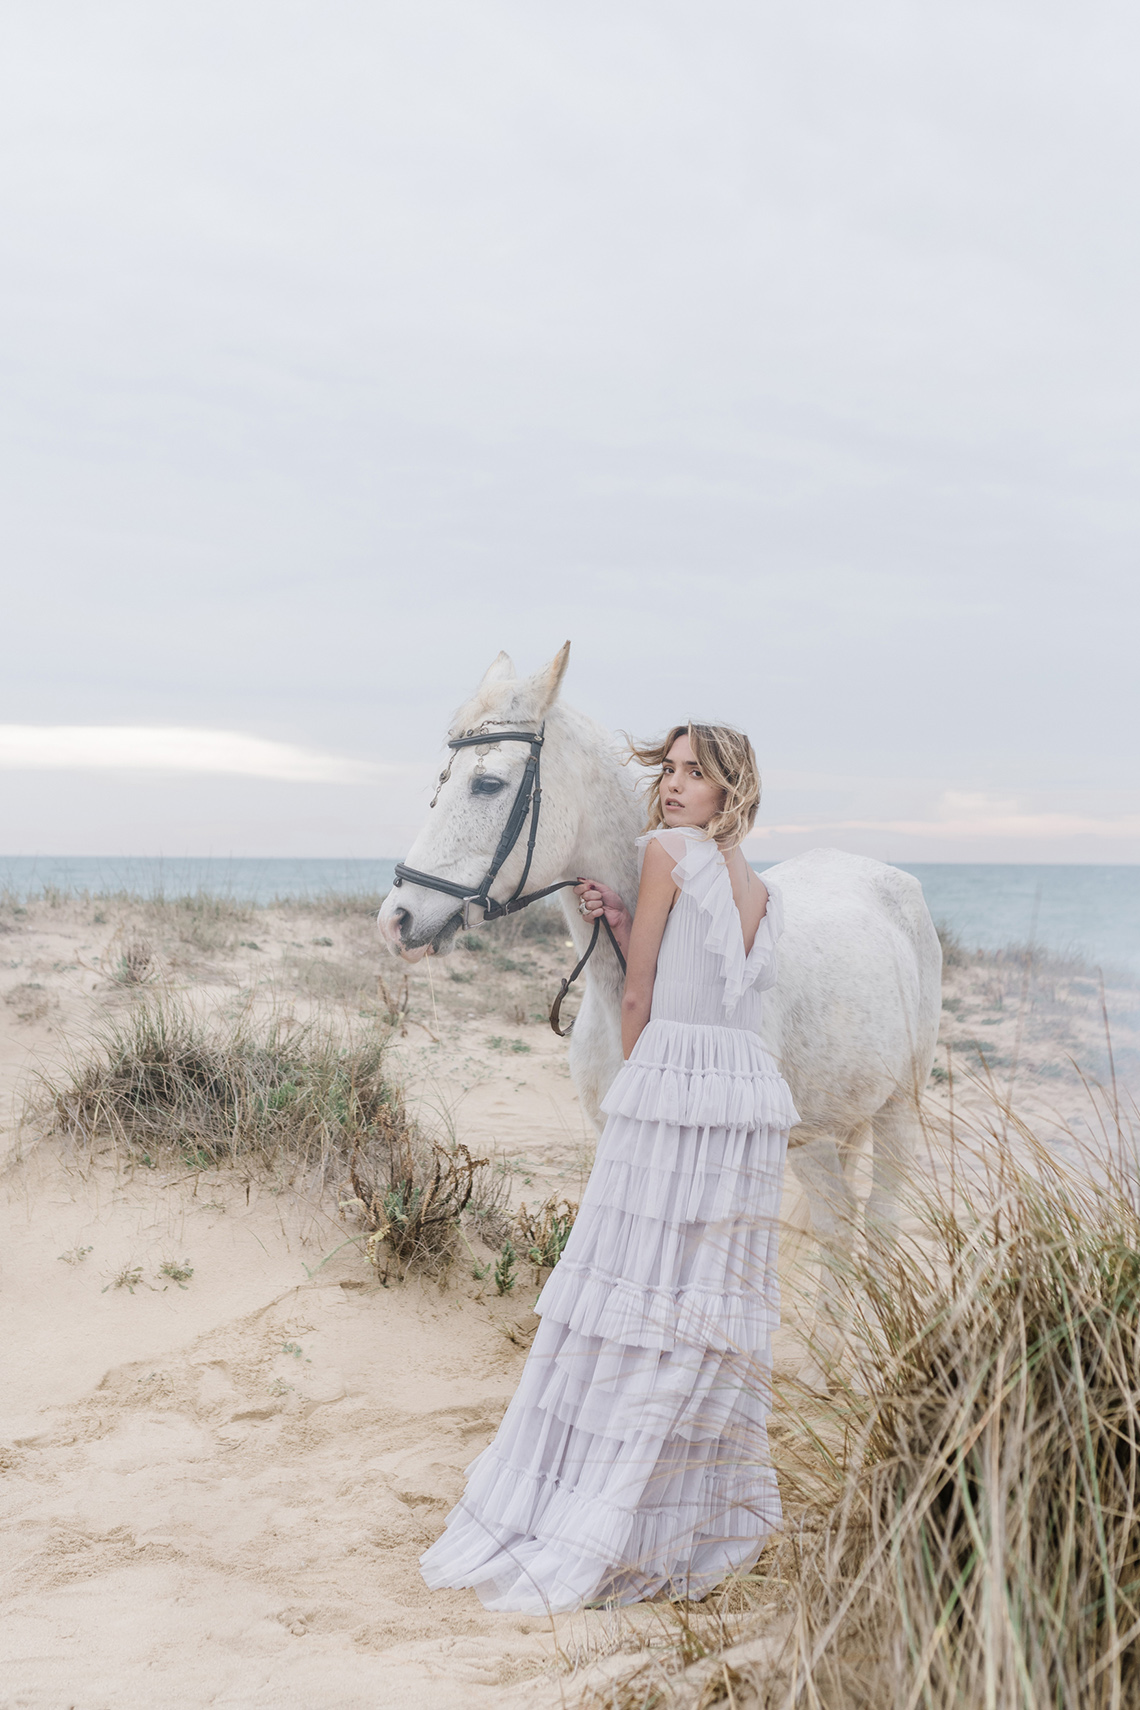 Couture Wedding Inspiration from the Beaches of Apulia – Le Velo Fotografia 27